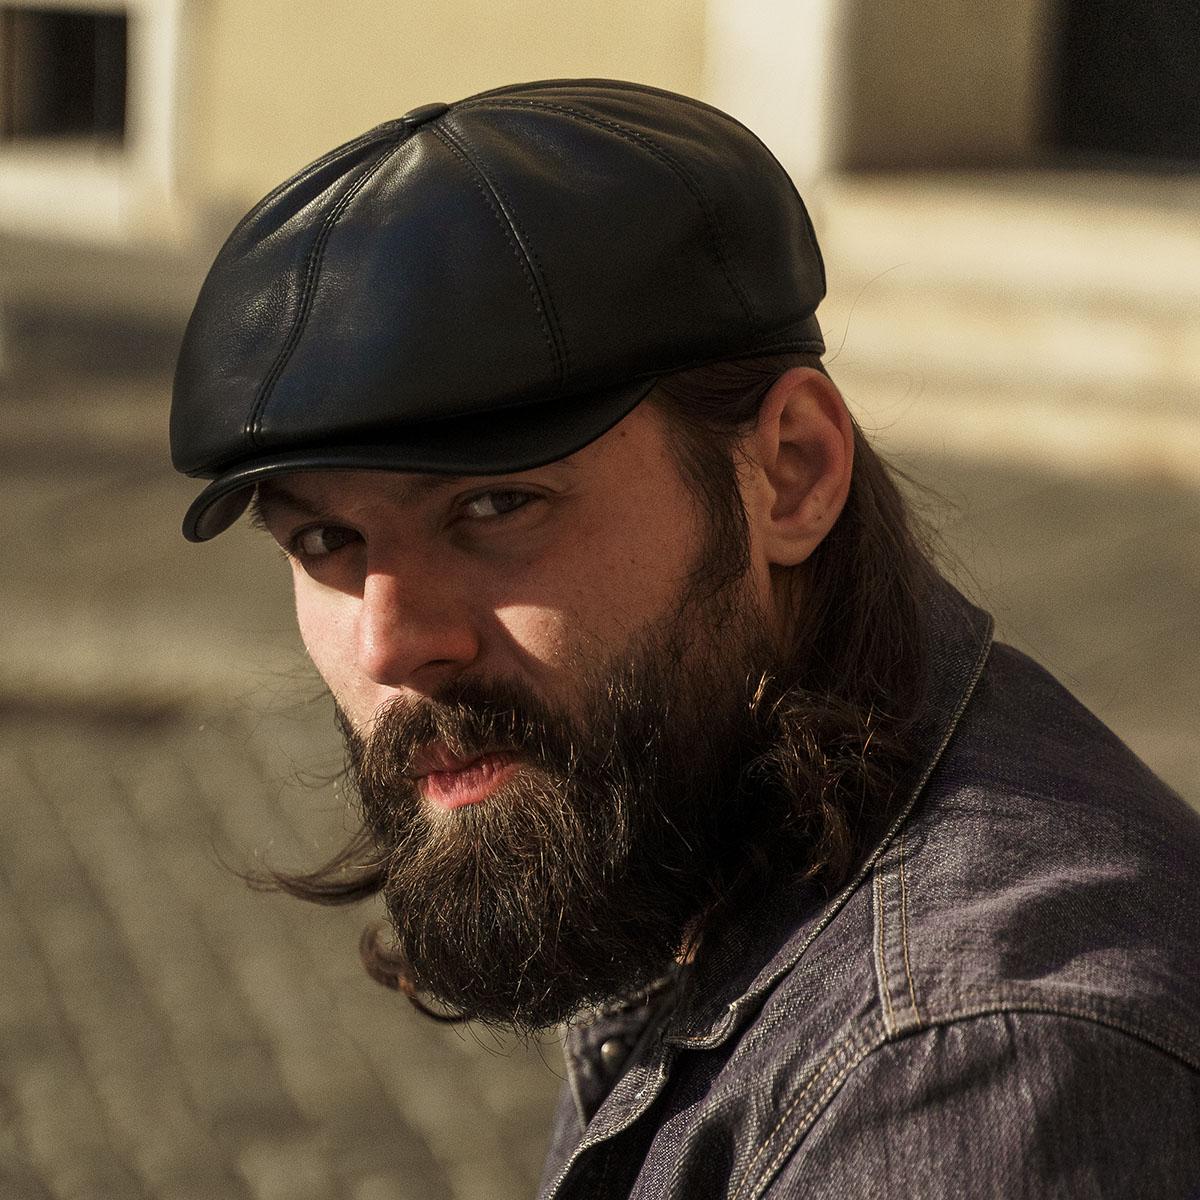 TonyGenuine leather gatsby 8 panels flat ivy cap irish poorboy applejack baker boy scally crook hooligan ivy bandit dai skin hat